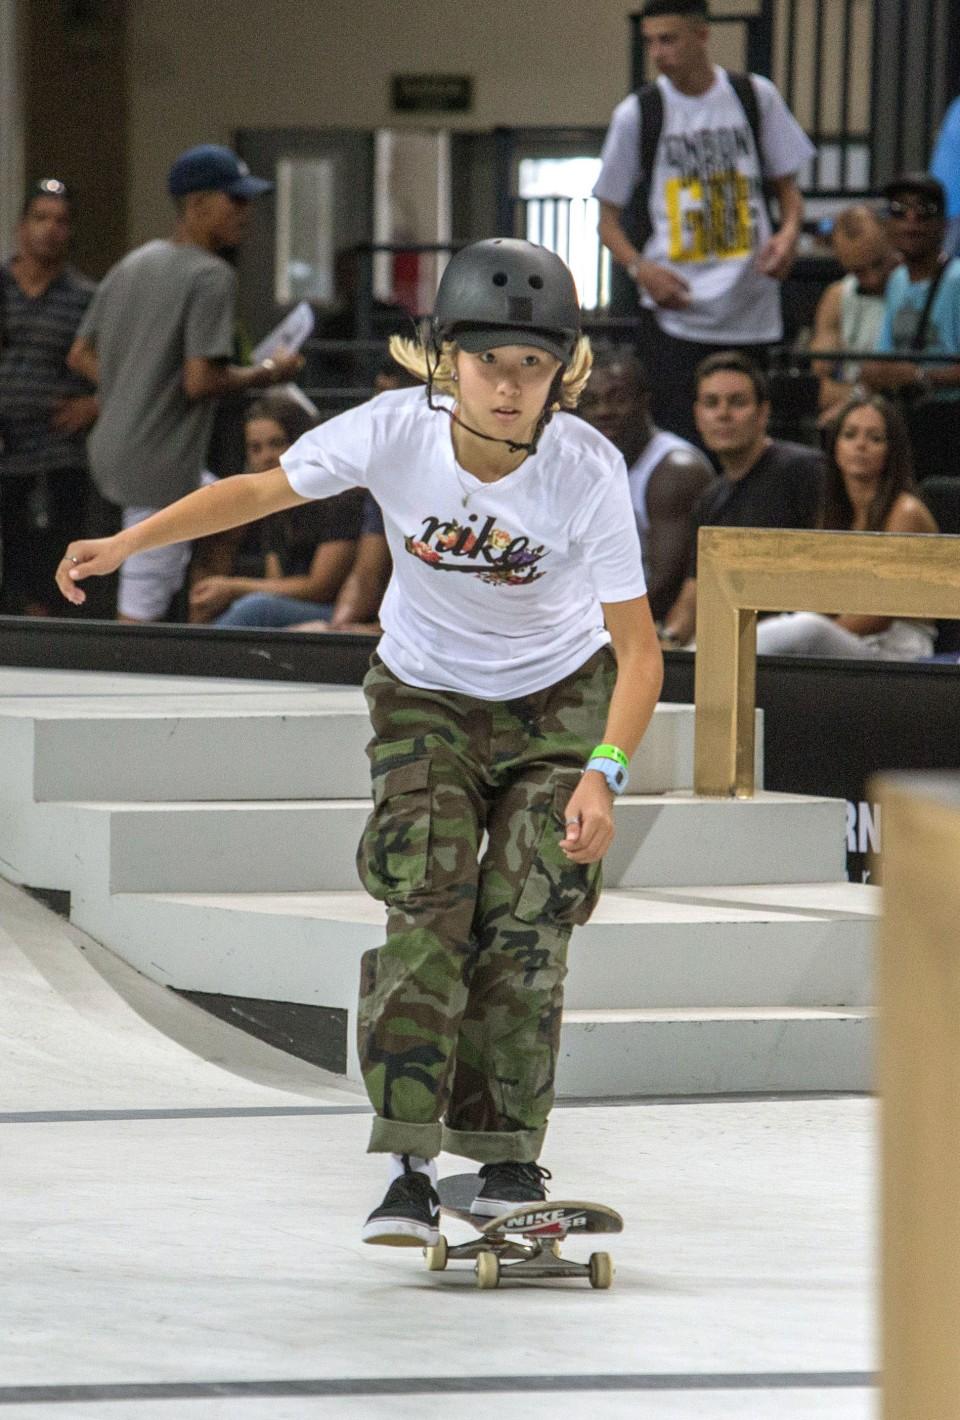 Skateboarding: Nishimura wins women's title at Street League